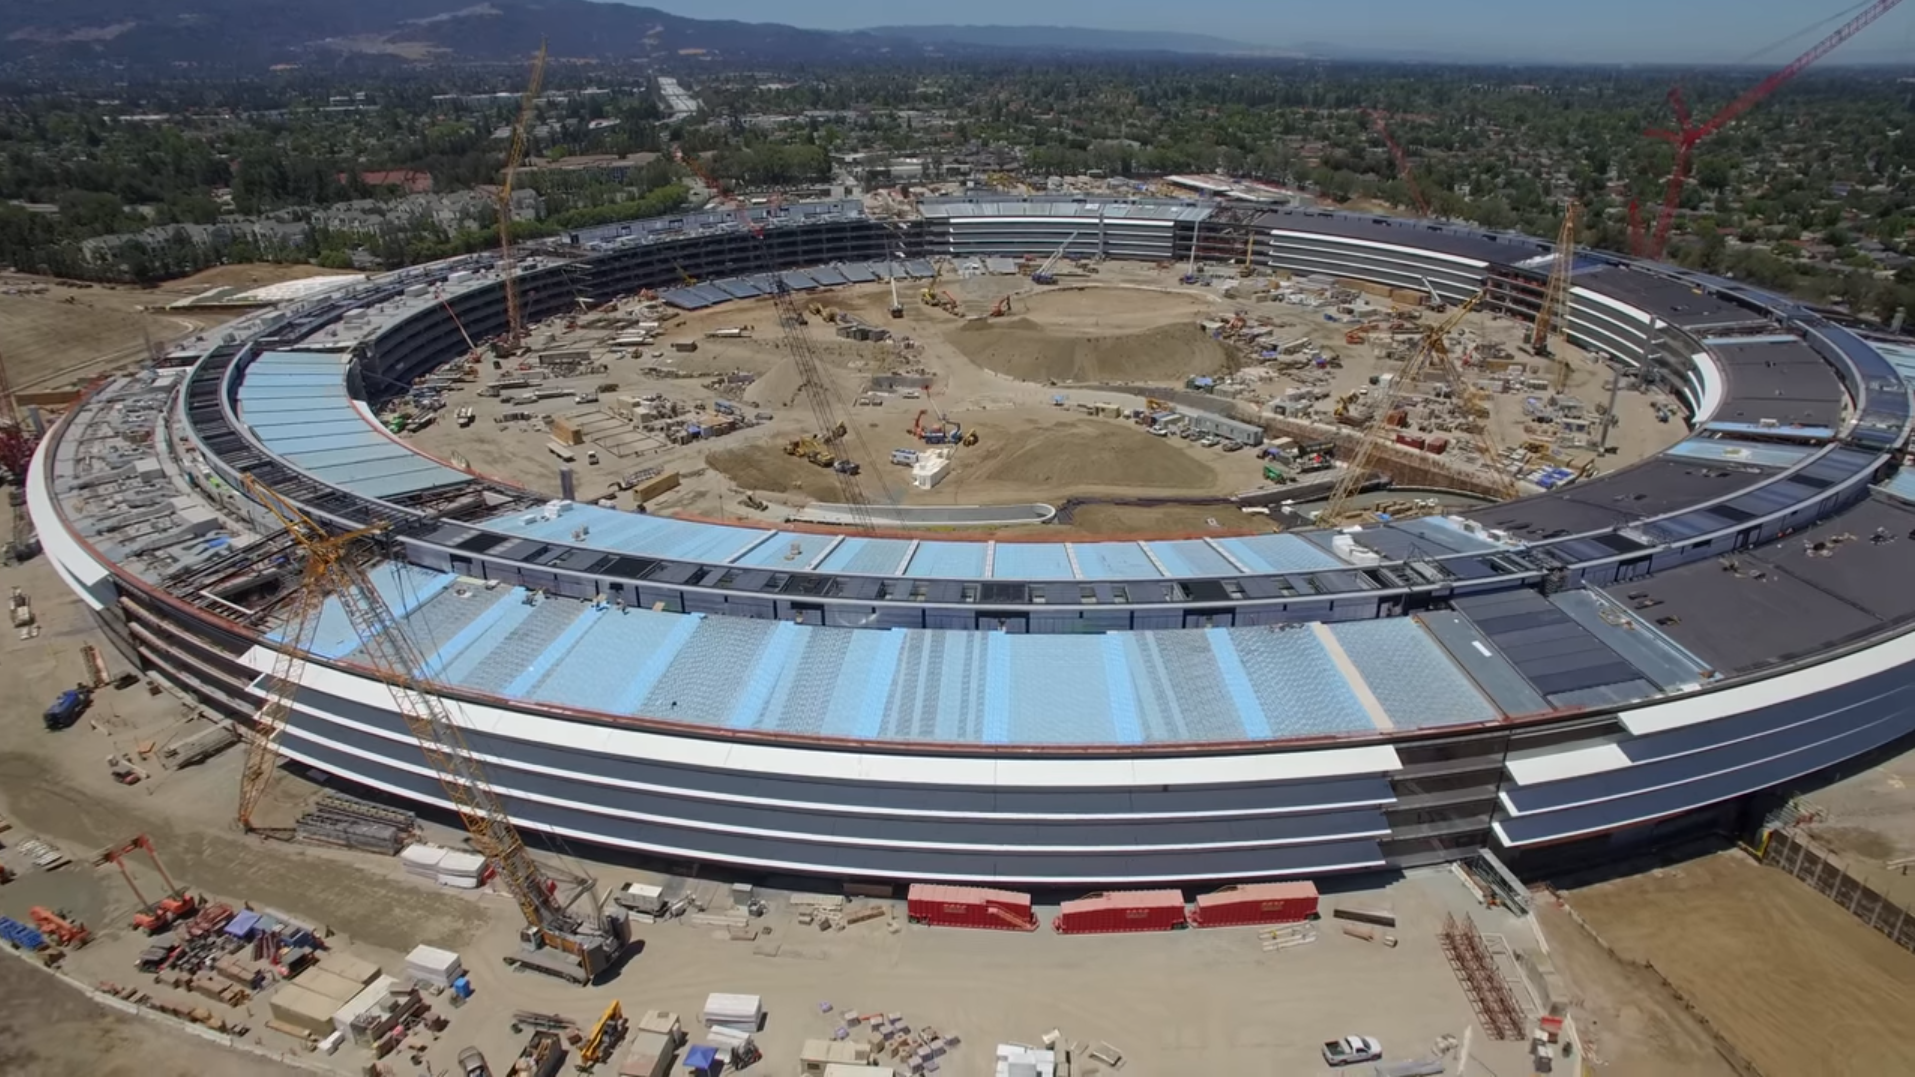 Apple Campus 2 Drone Footage Shows Construction Progress